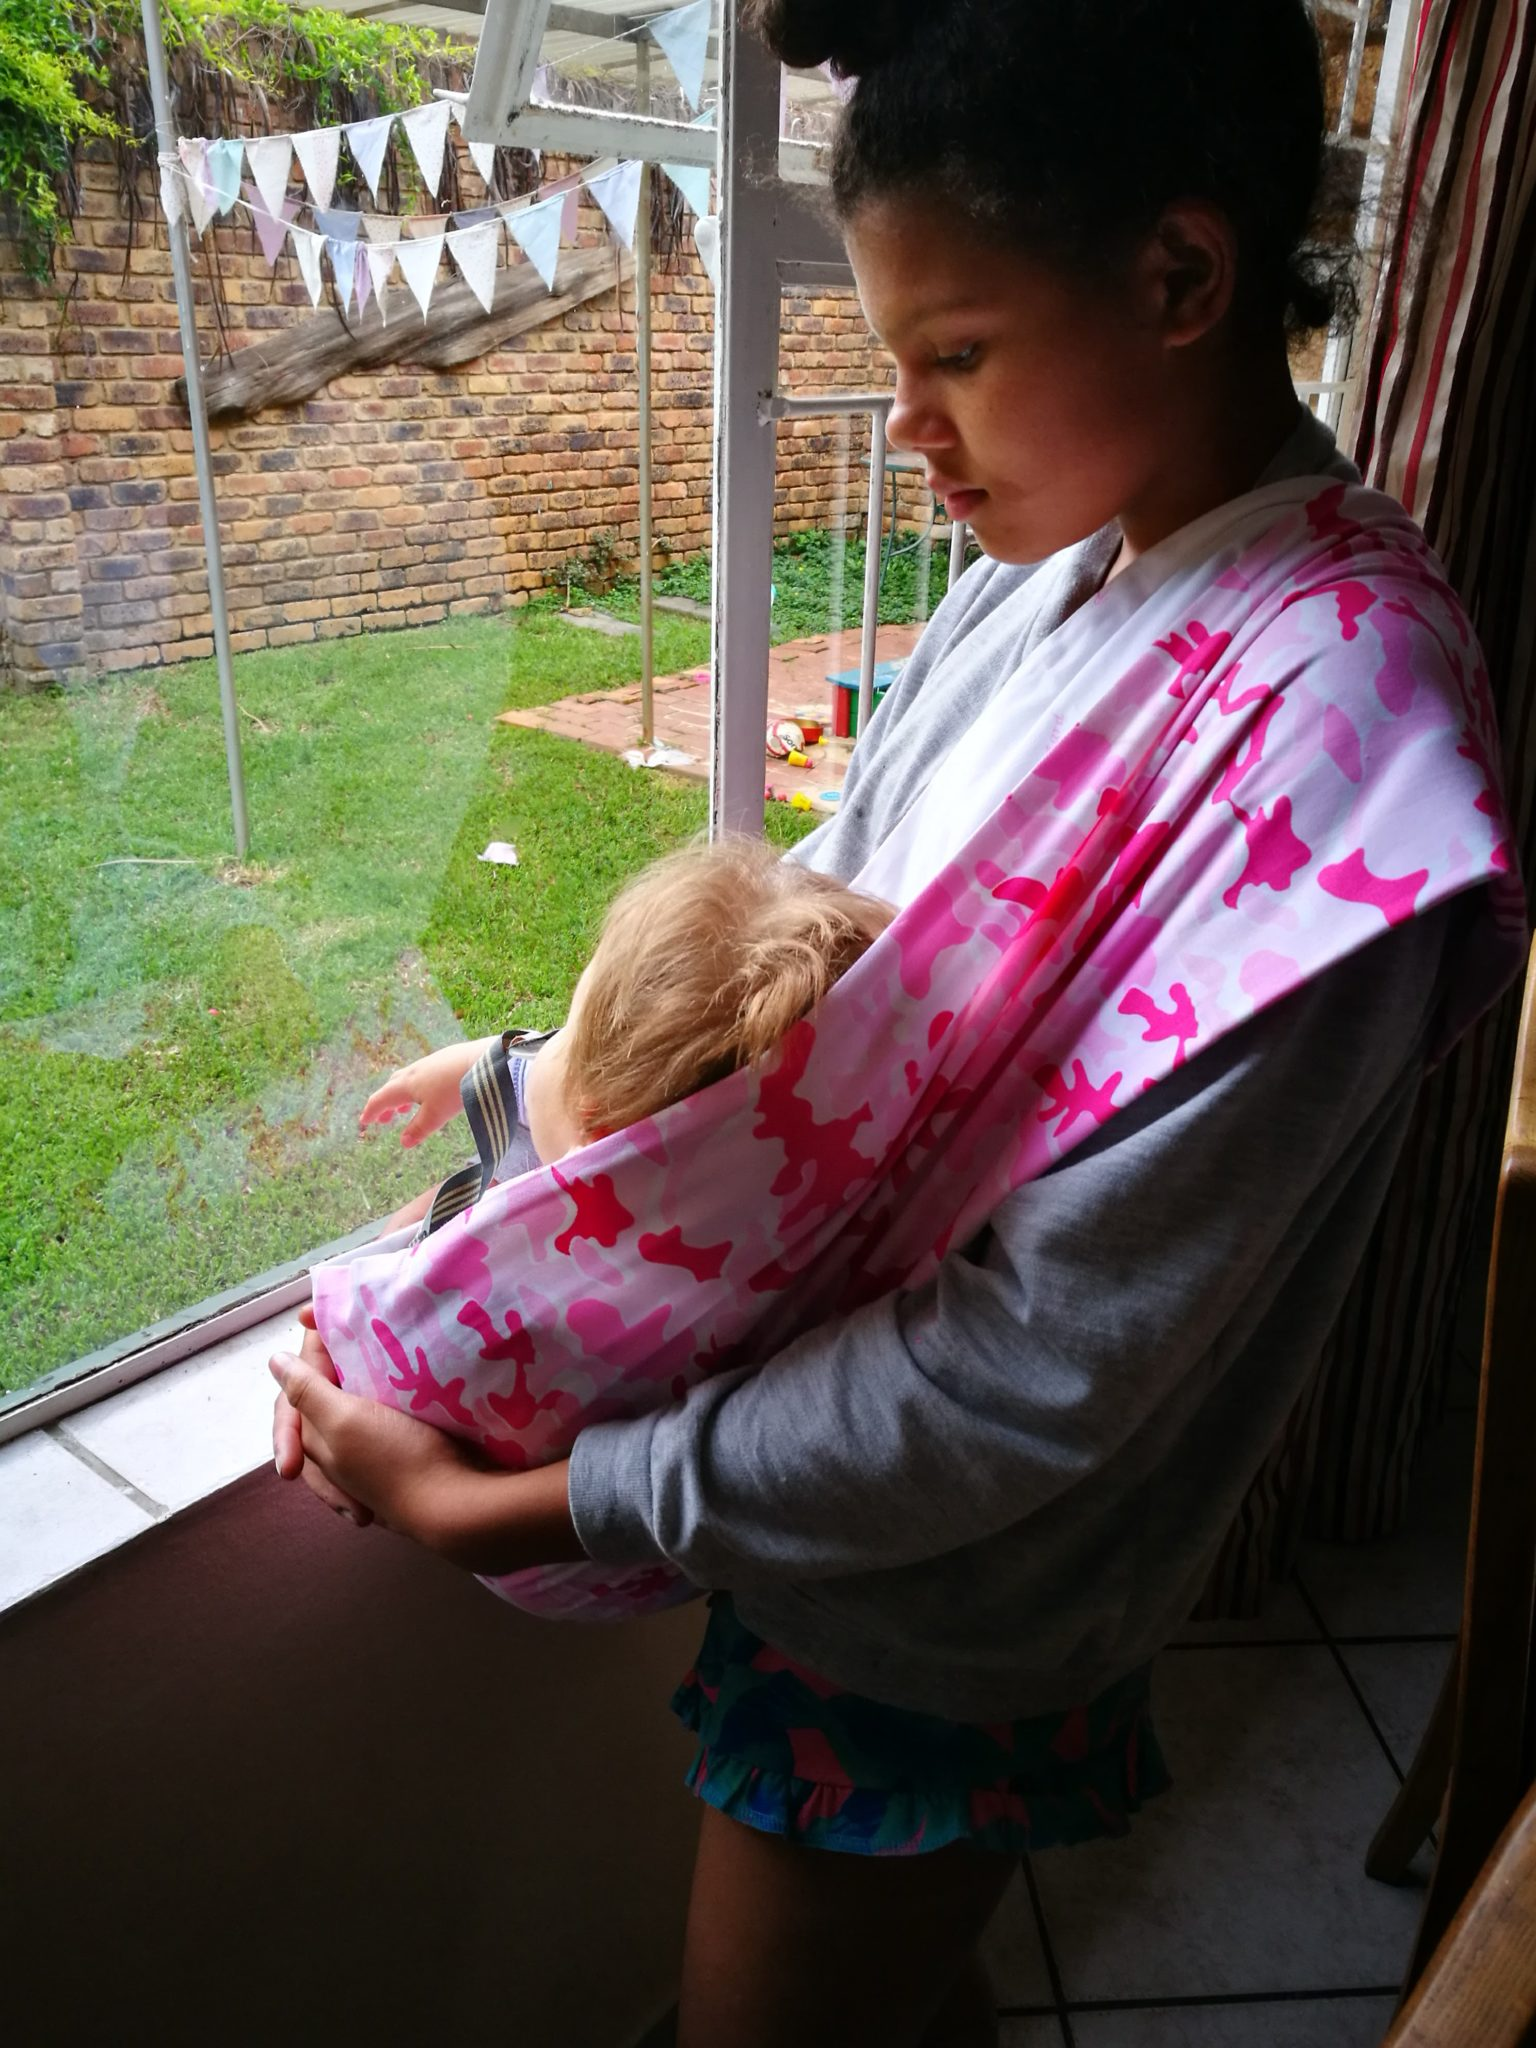 Baby Sling|HarassedMom